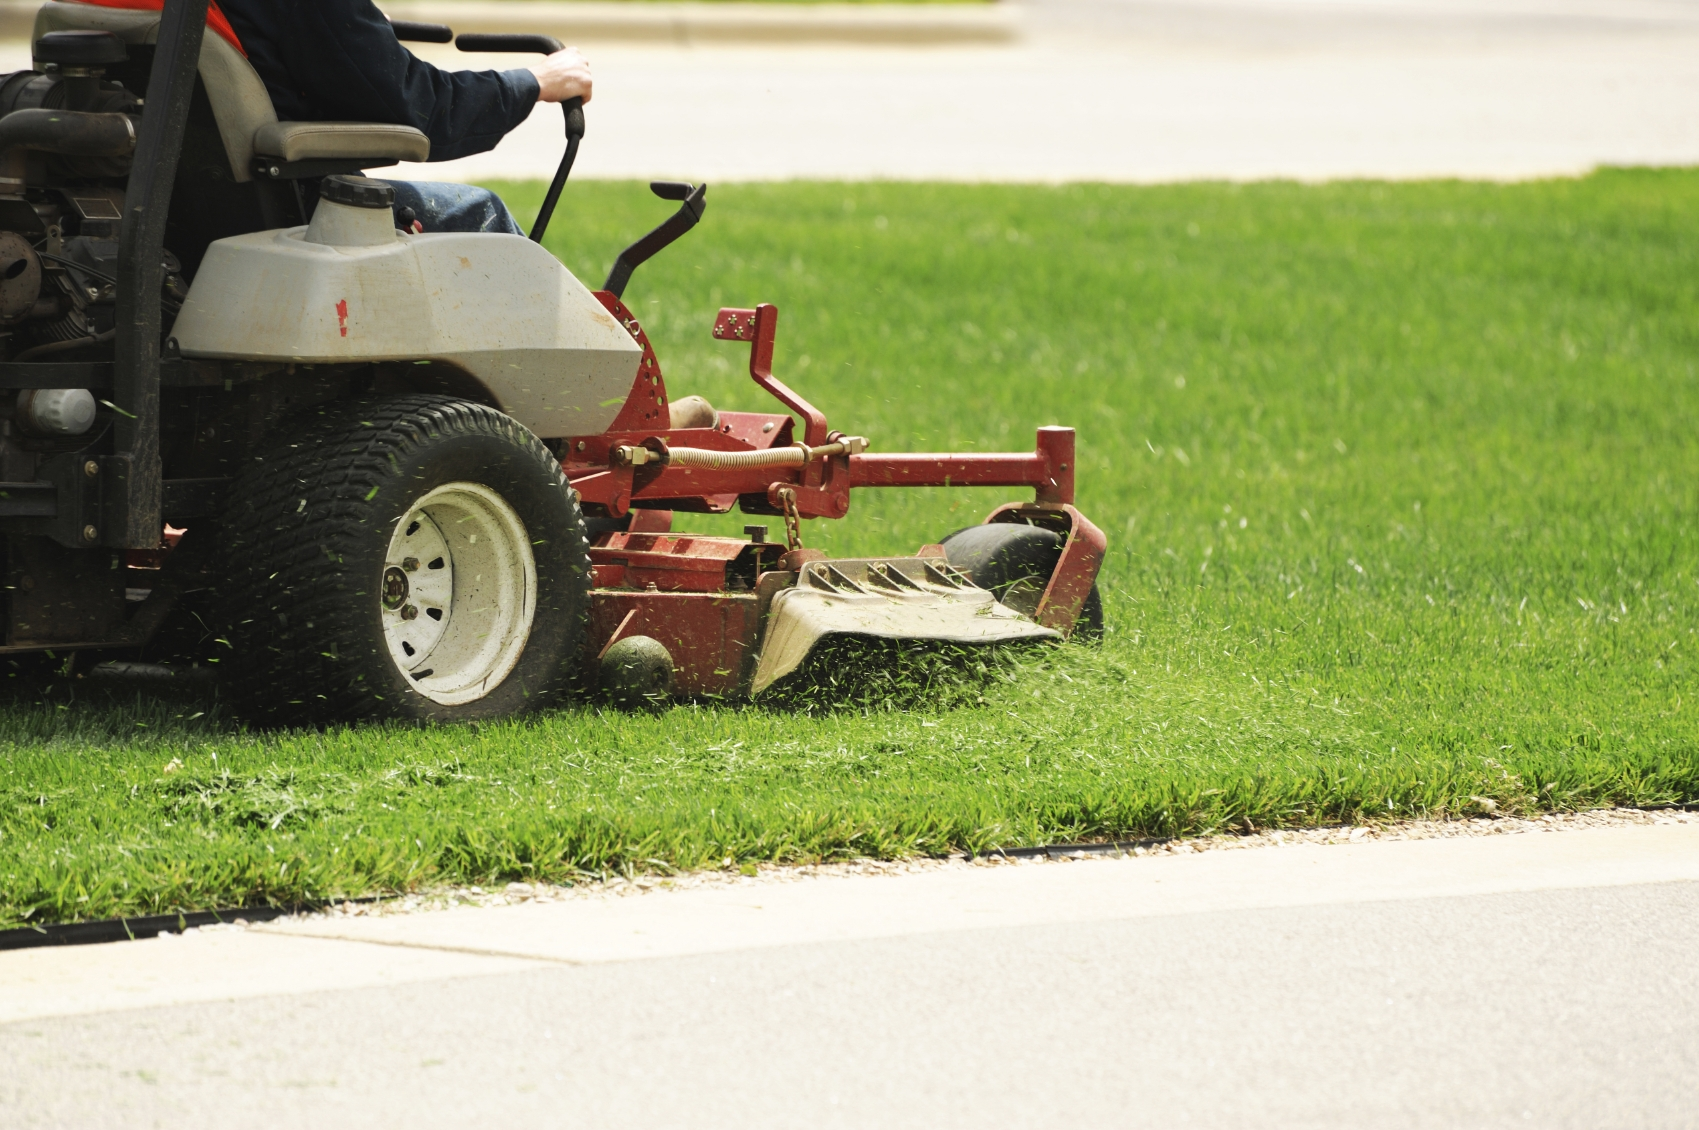 Funny lawn mower videos